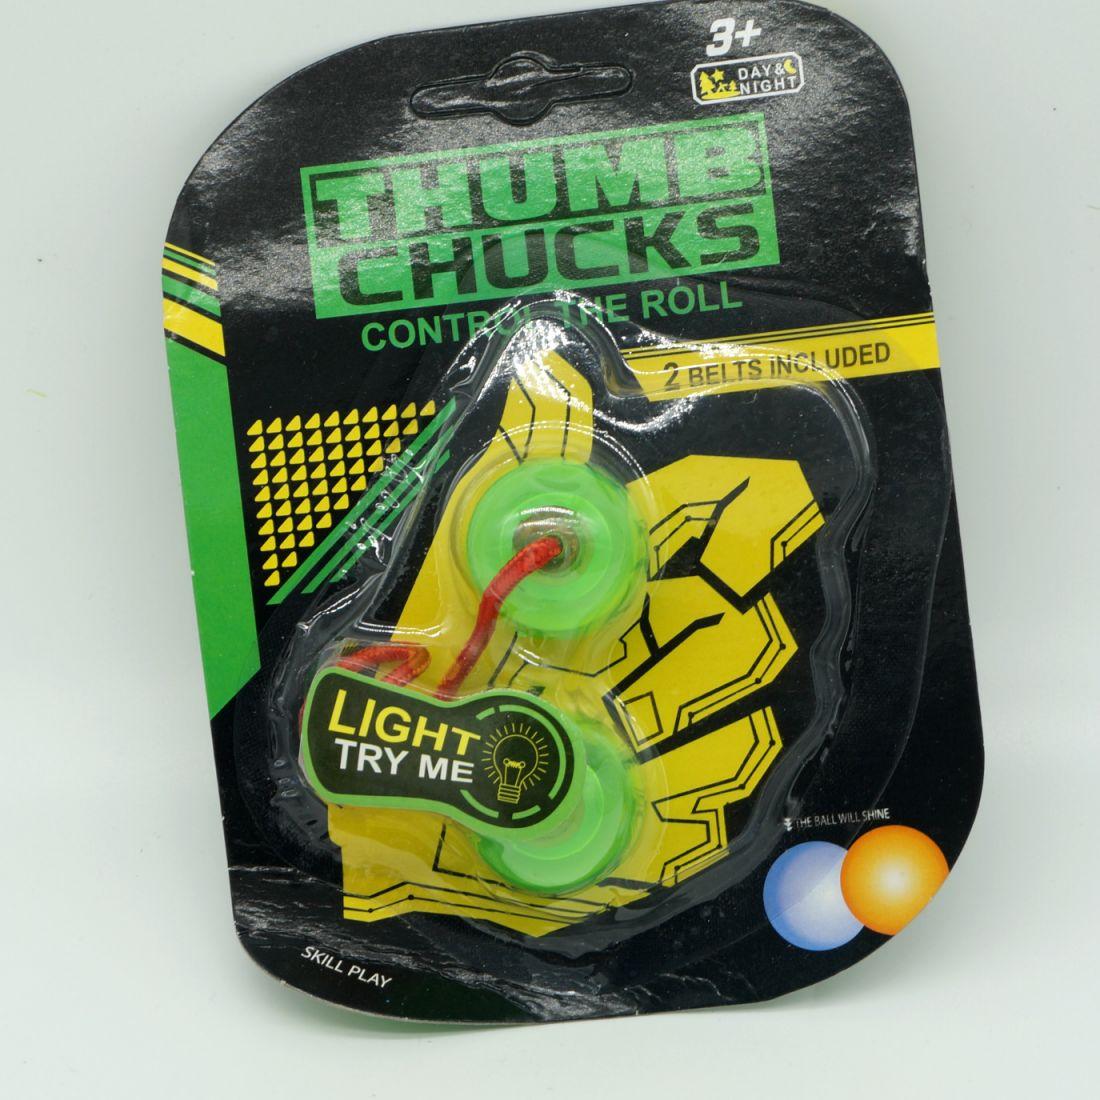 "Светящаяся скиллтой-игрушка ""thumb chucks """